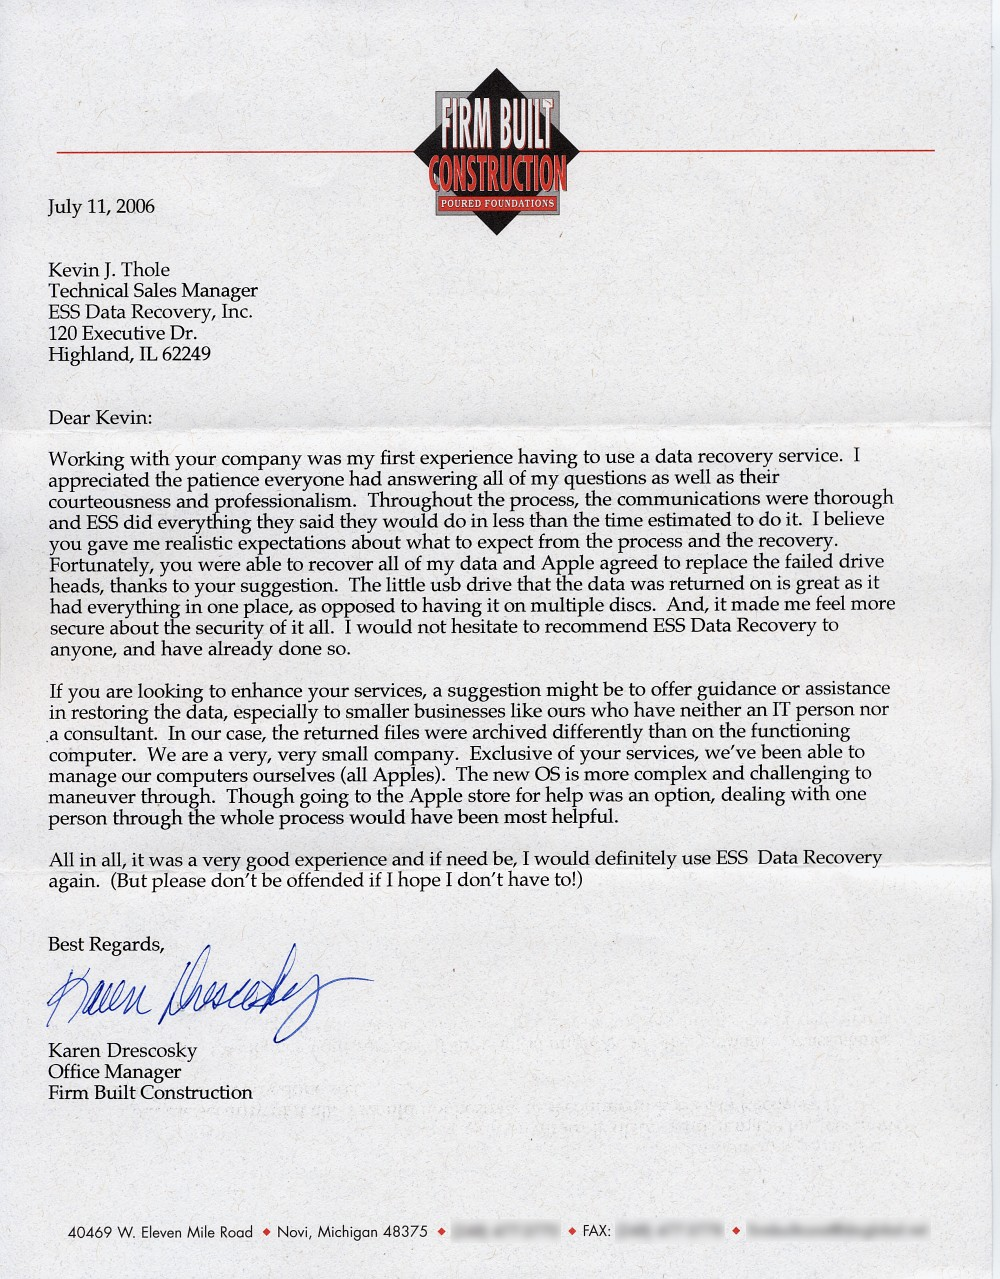 Firm Built Construction testimonial letter